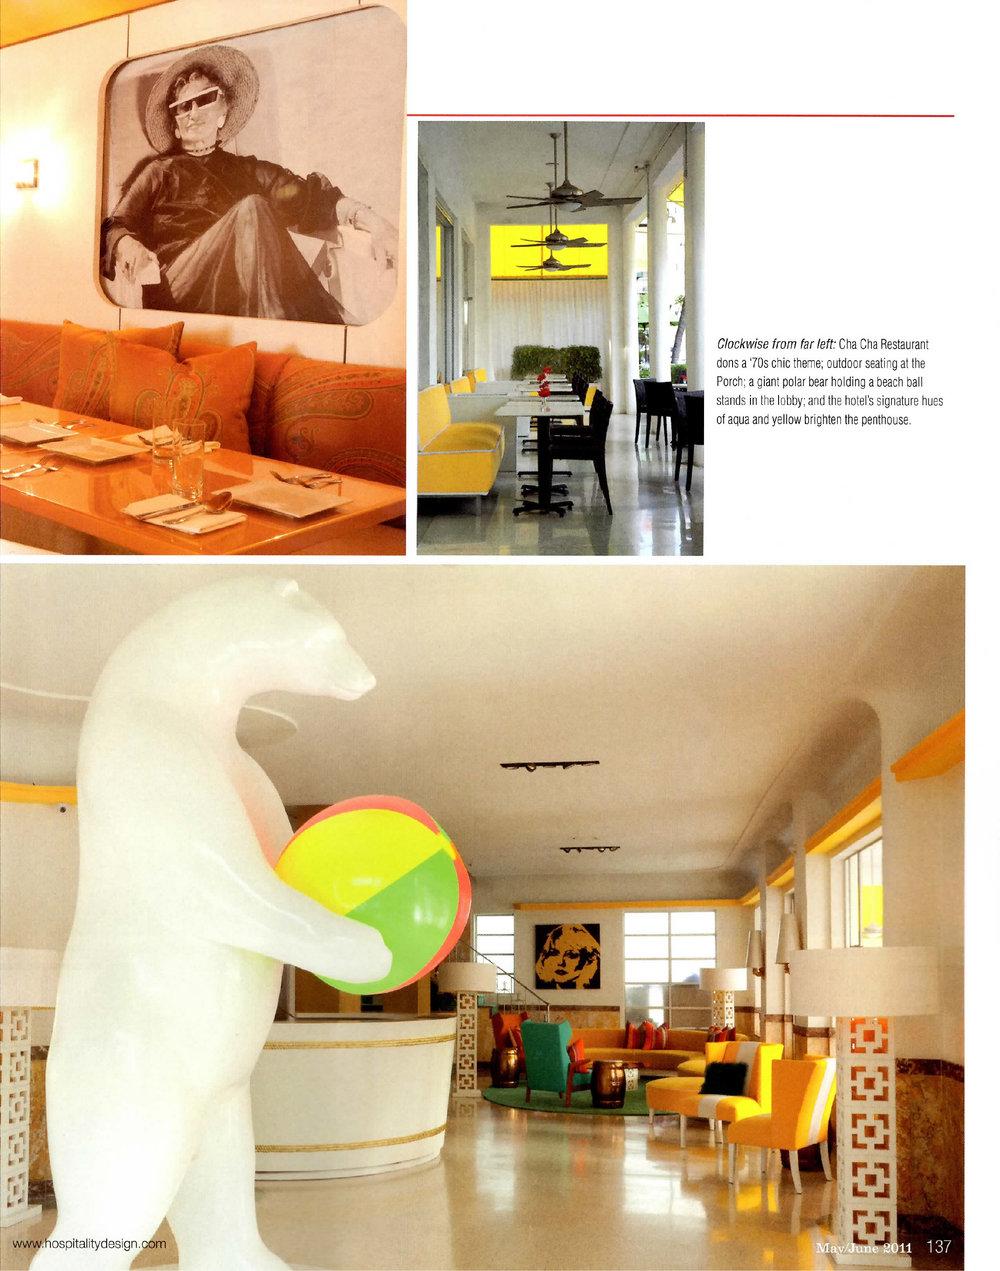 BHDM Hospitality Design 6.1.11 3.jpg